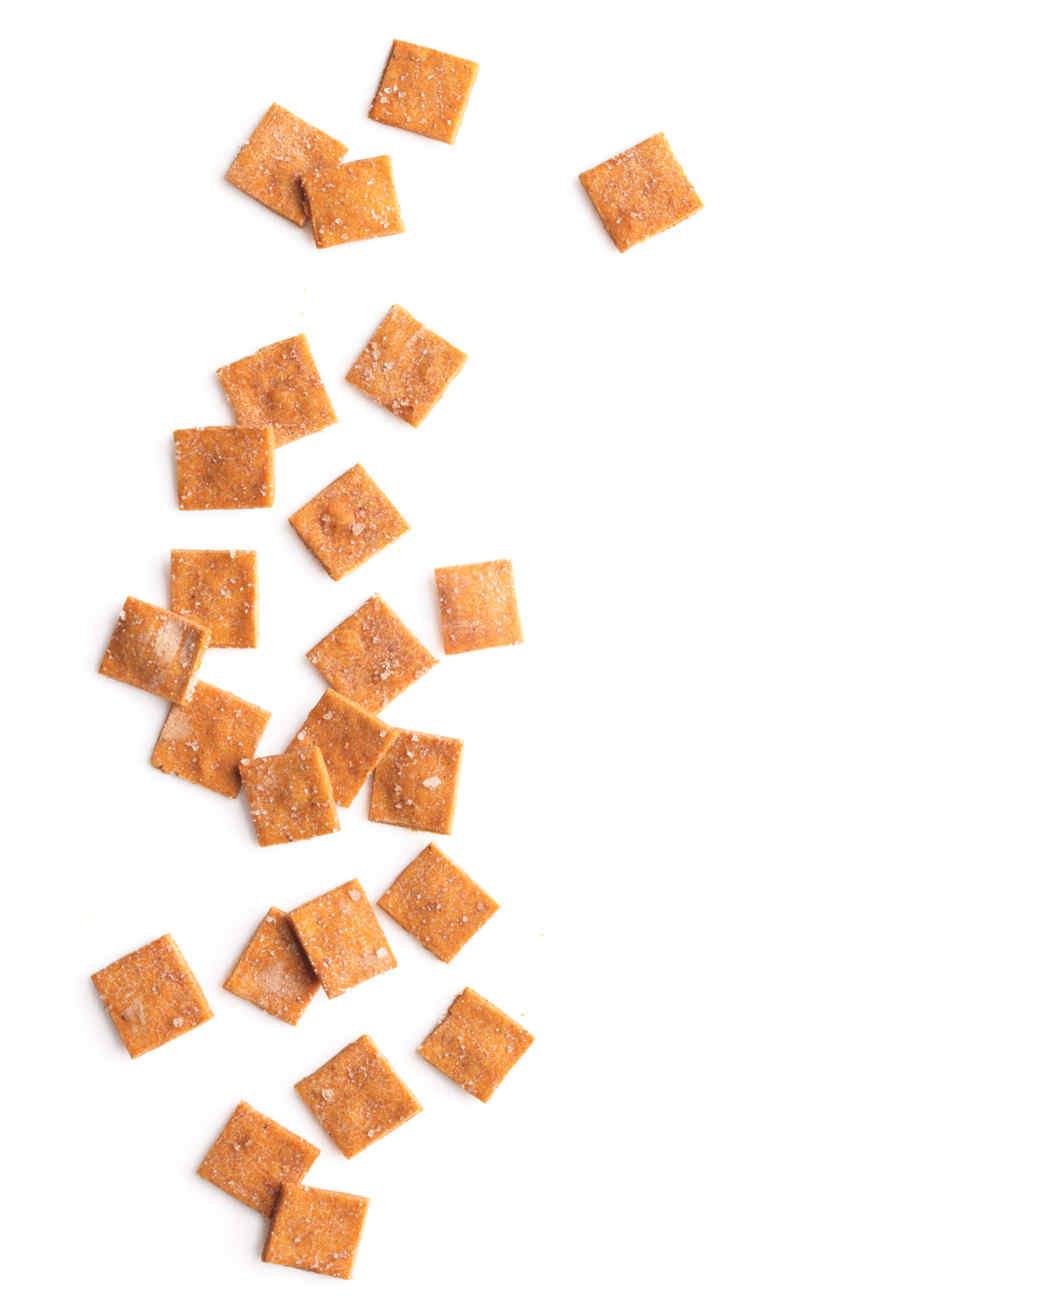 Gluten-Free Smoky Crackers